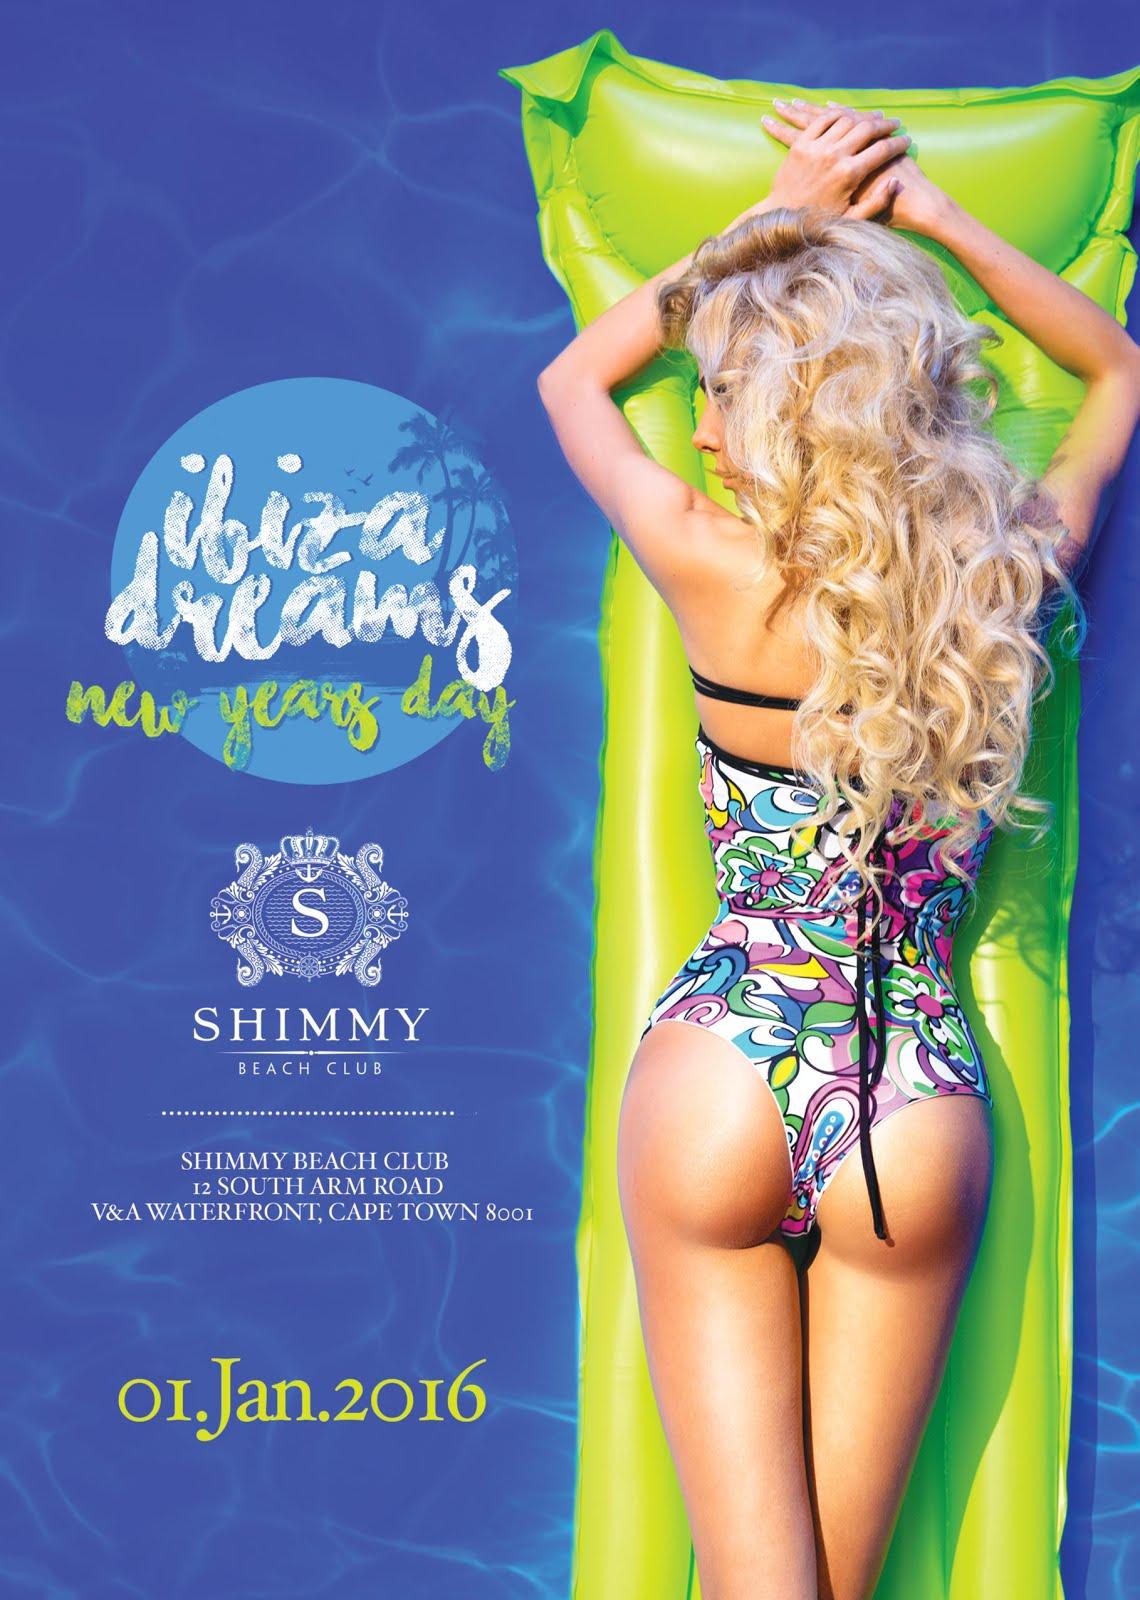 IBIZA DREAMS   A New Year's Day 2016  Party at Shimmy